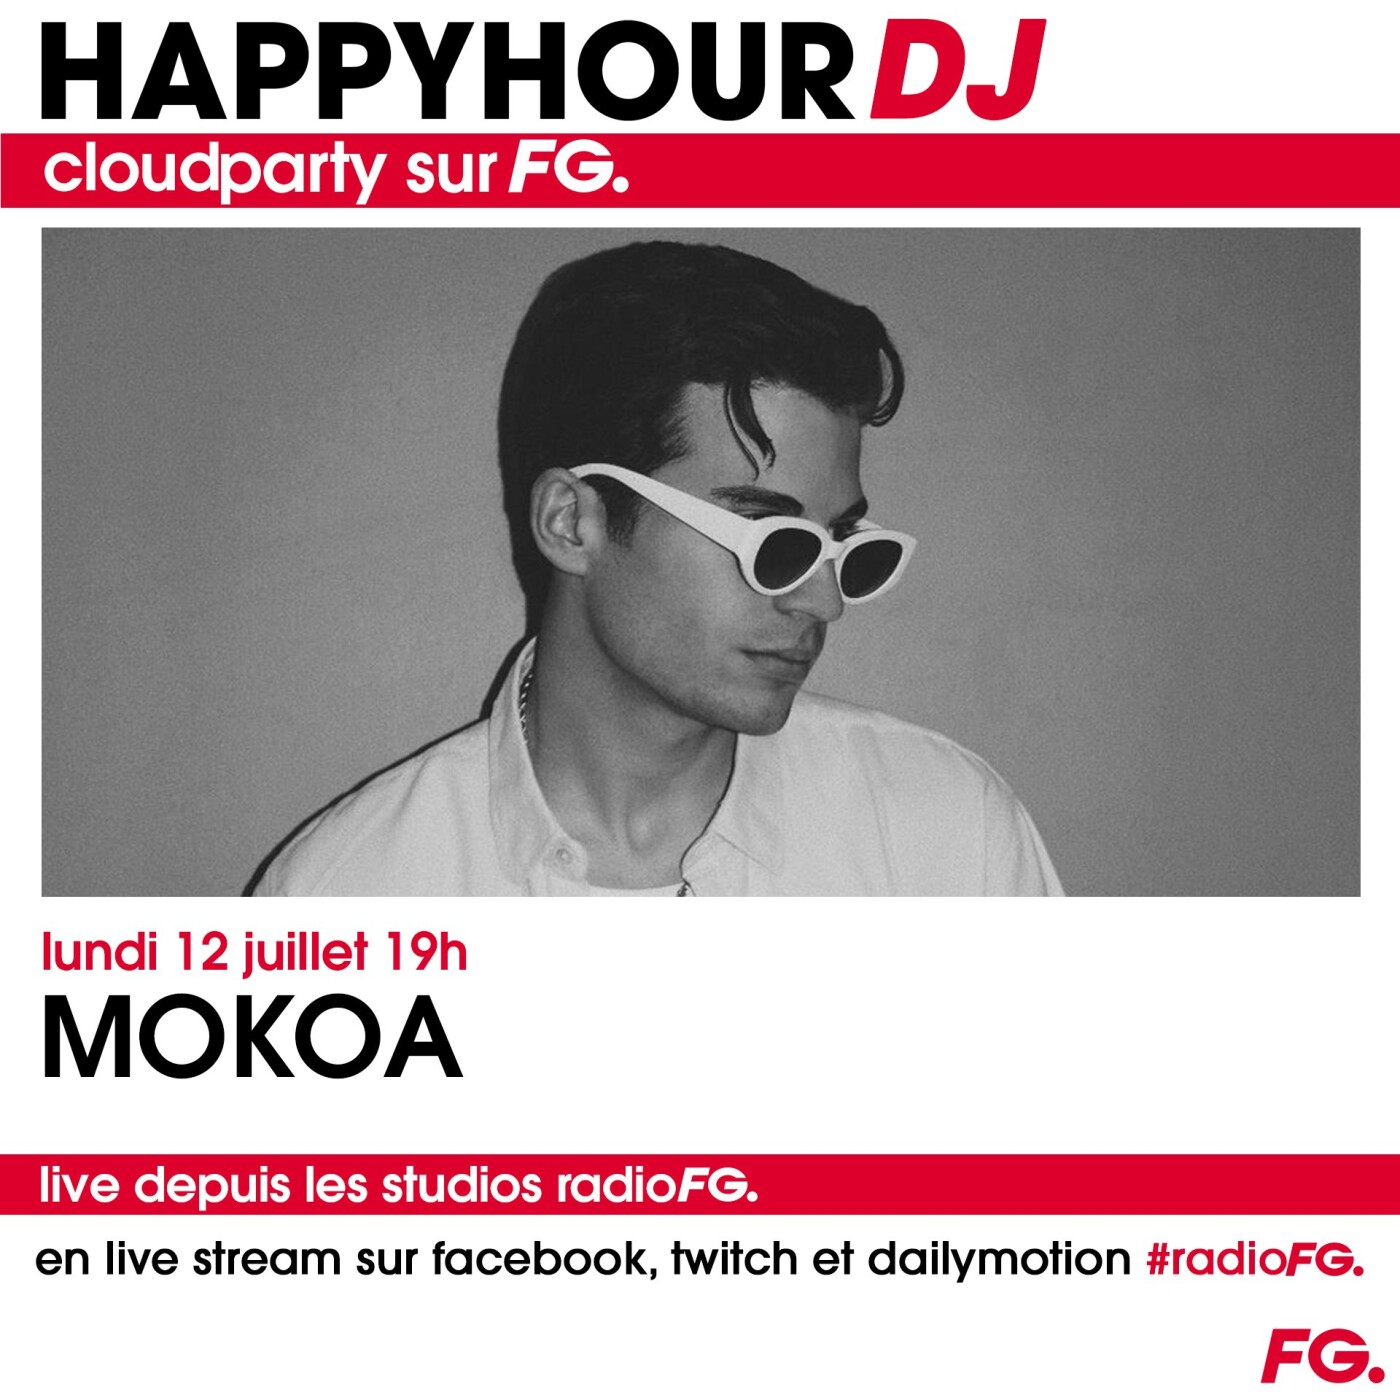 HAPPY HOUR DJ : MOKOA